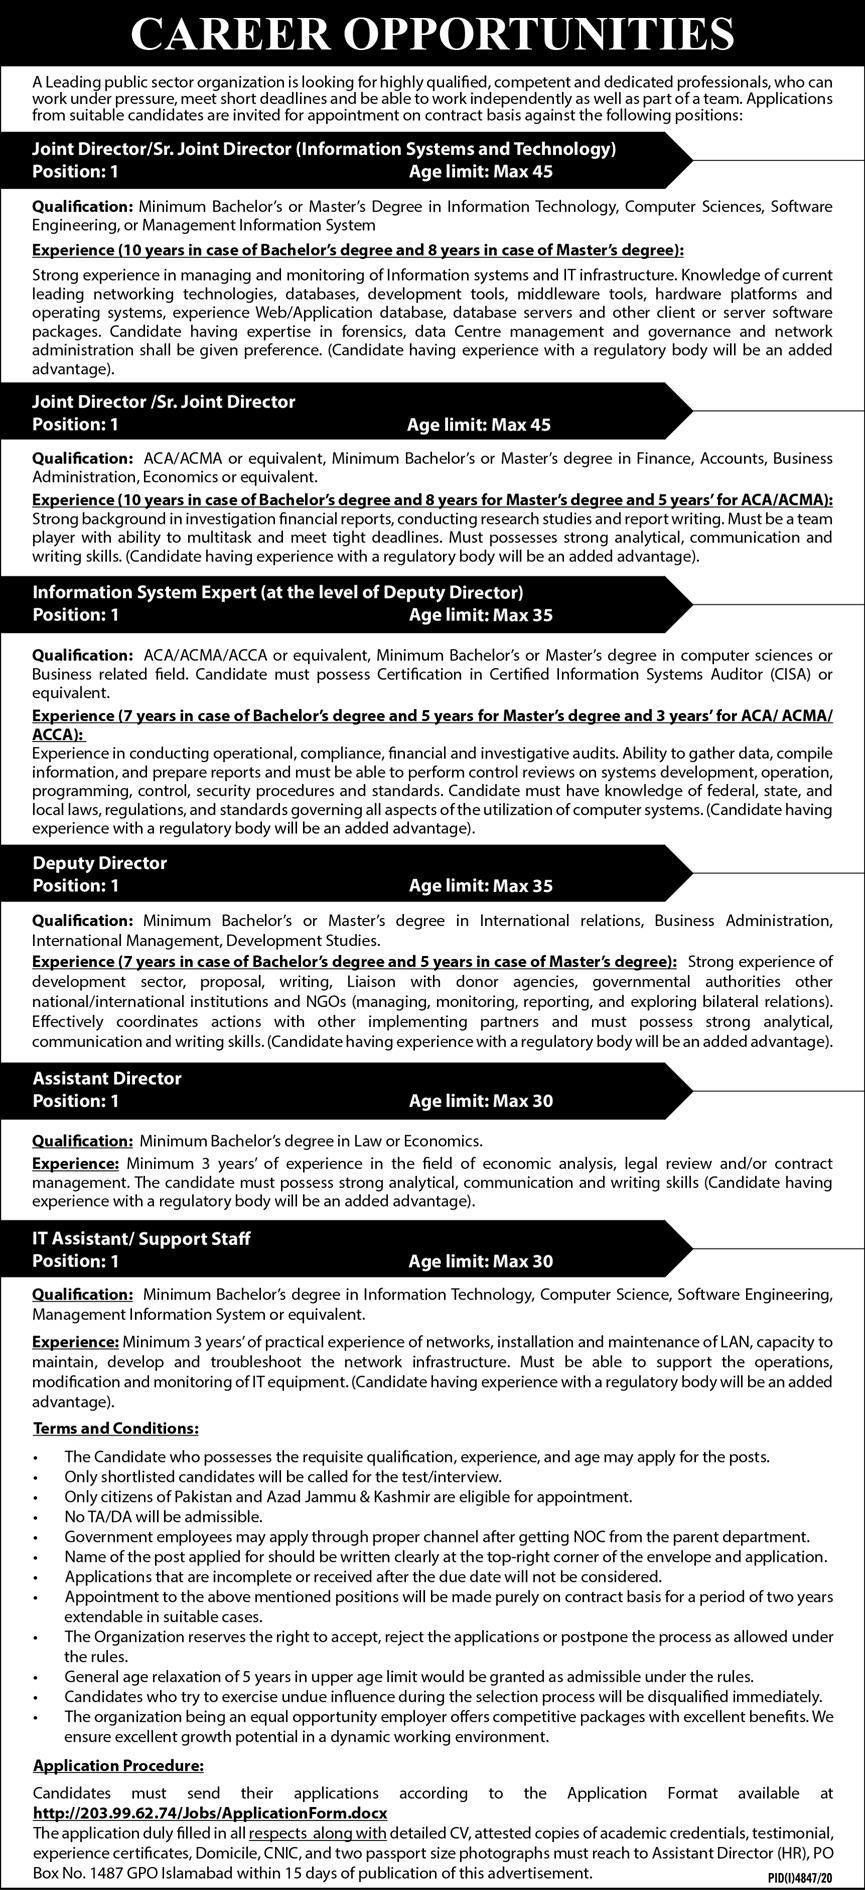 Federal Government Organization PO Box 1487 Islamabad Jobs 2021